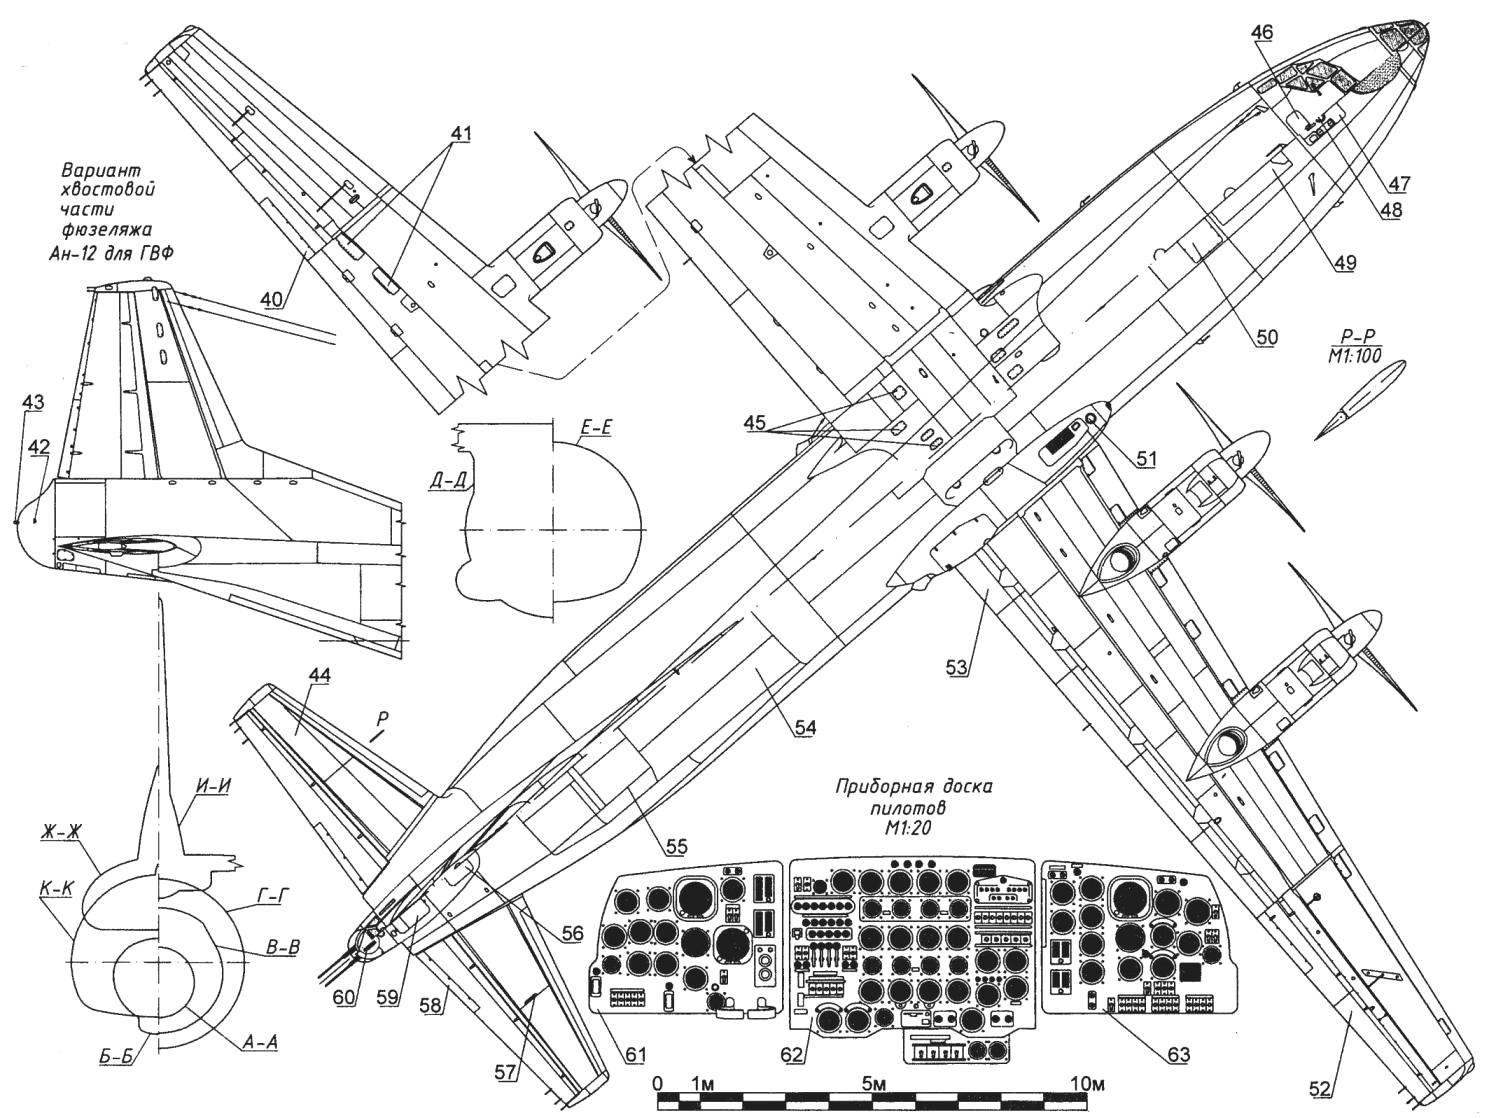 Military transport aircraft An-12B